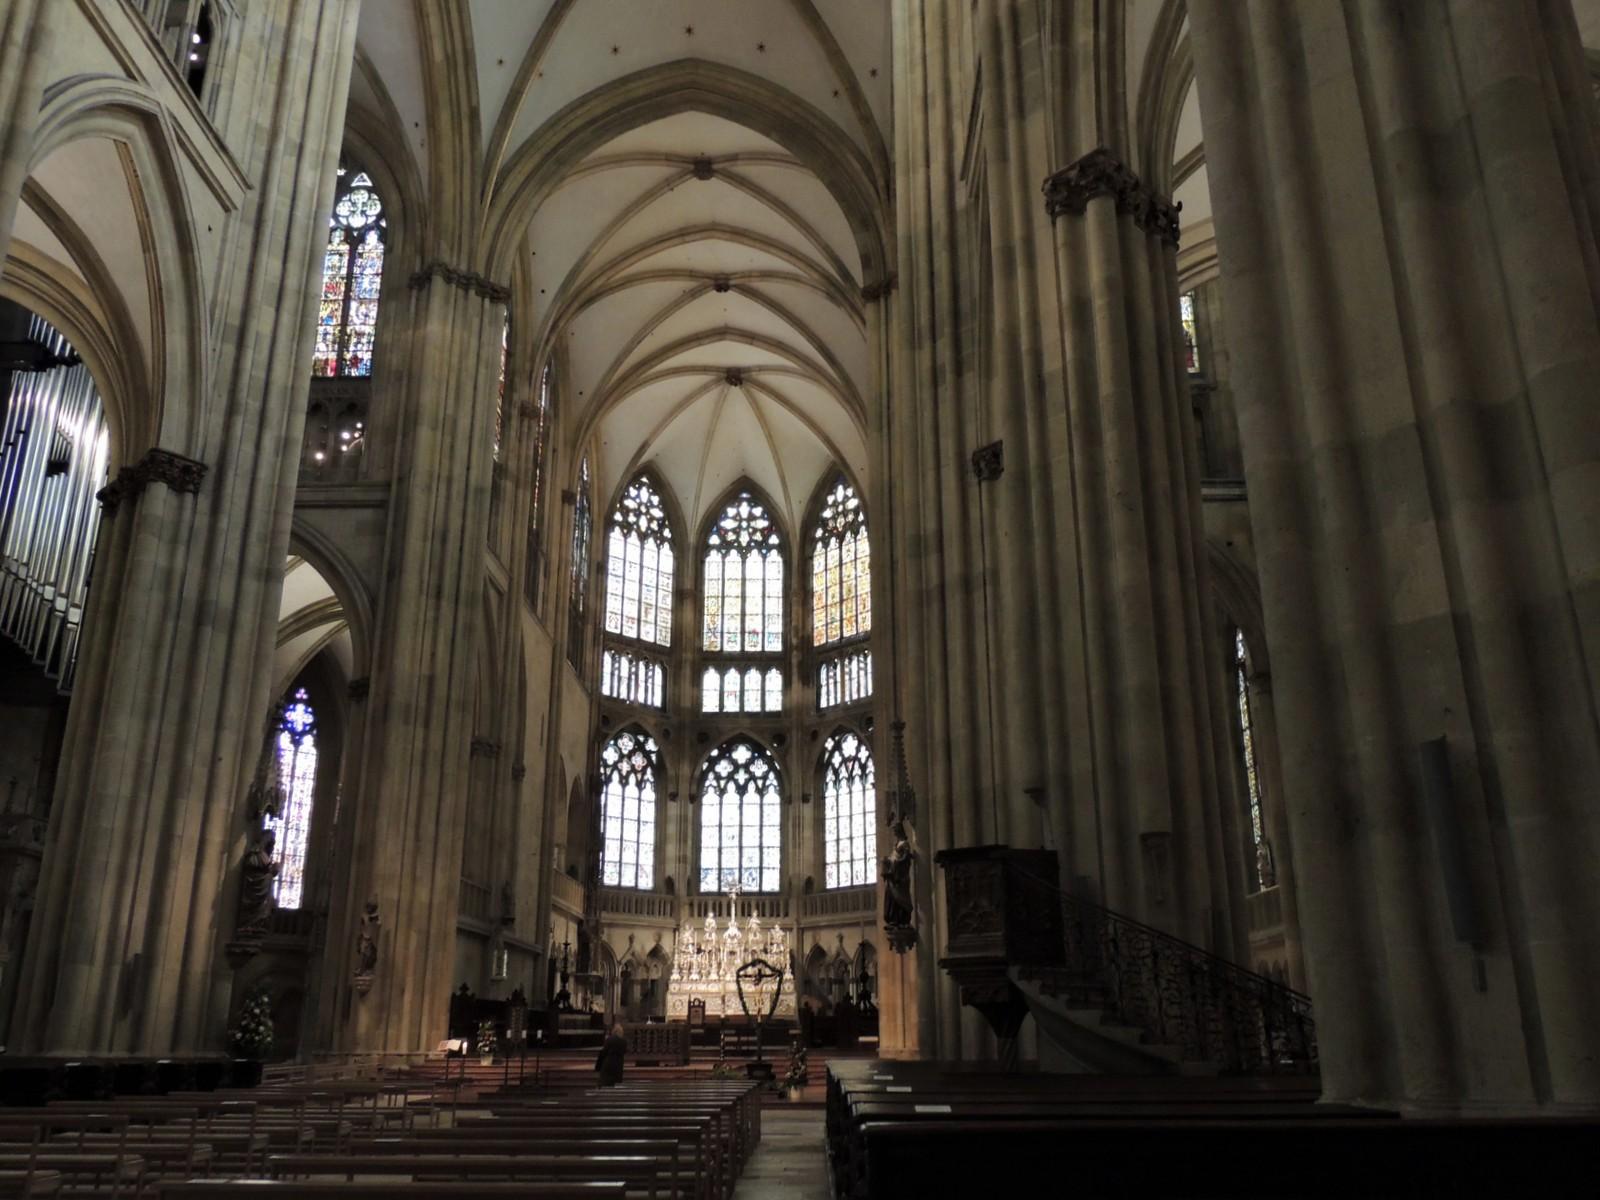 Regensburg - Innenraum des Doms St. Peter